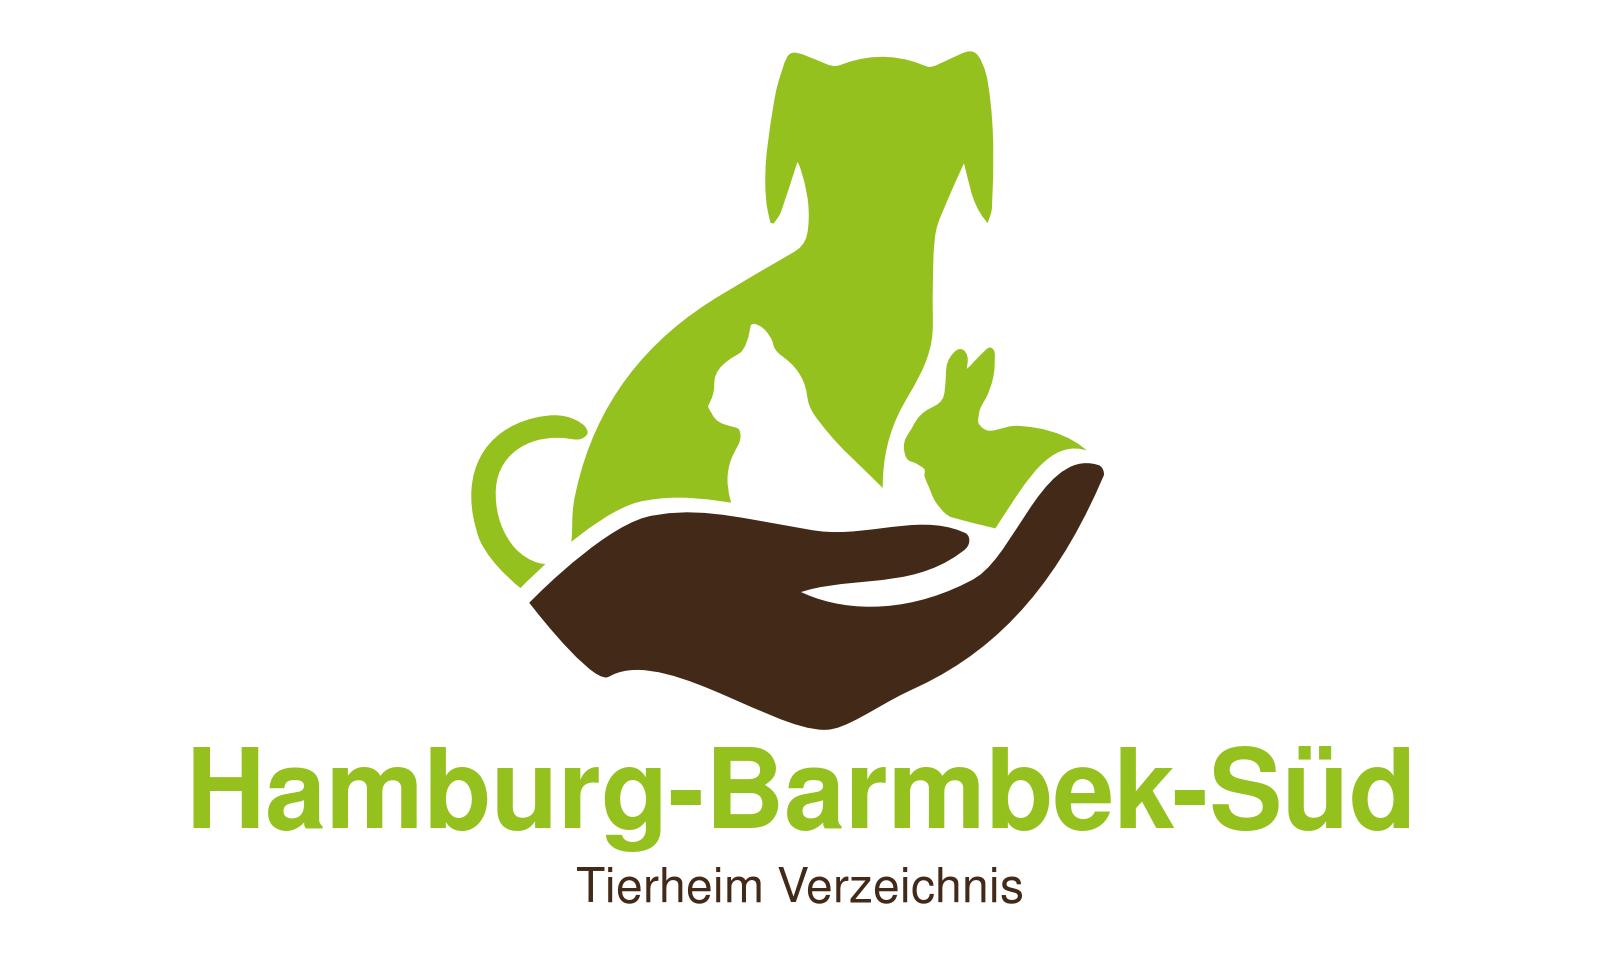 Tierheim Hamburg Barmbek-Süd